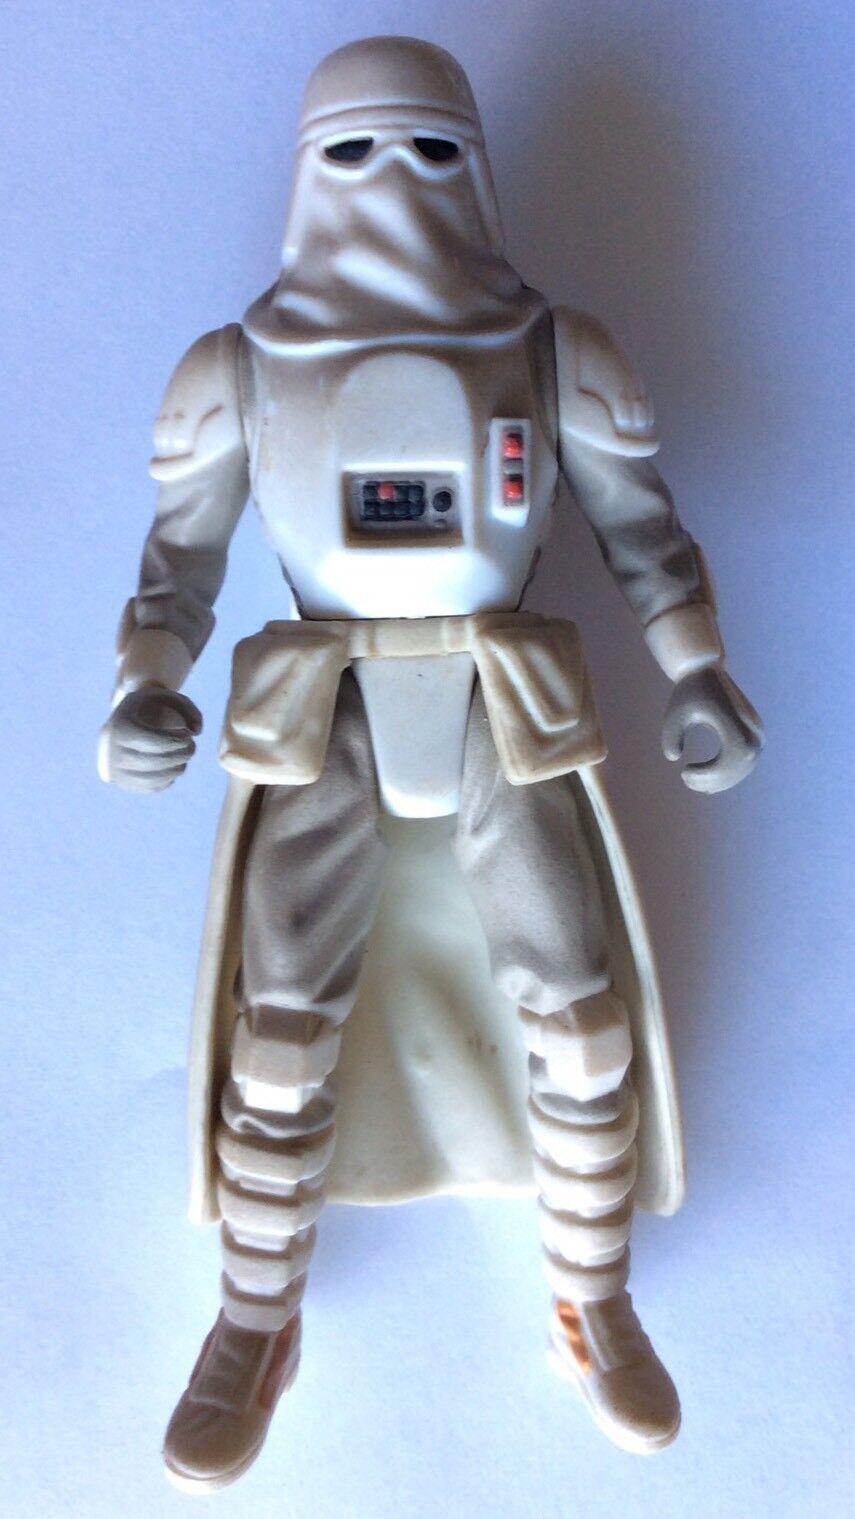 Star wars millennium - snowtrooper - prototyp - münze geprägt